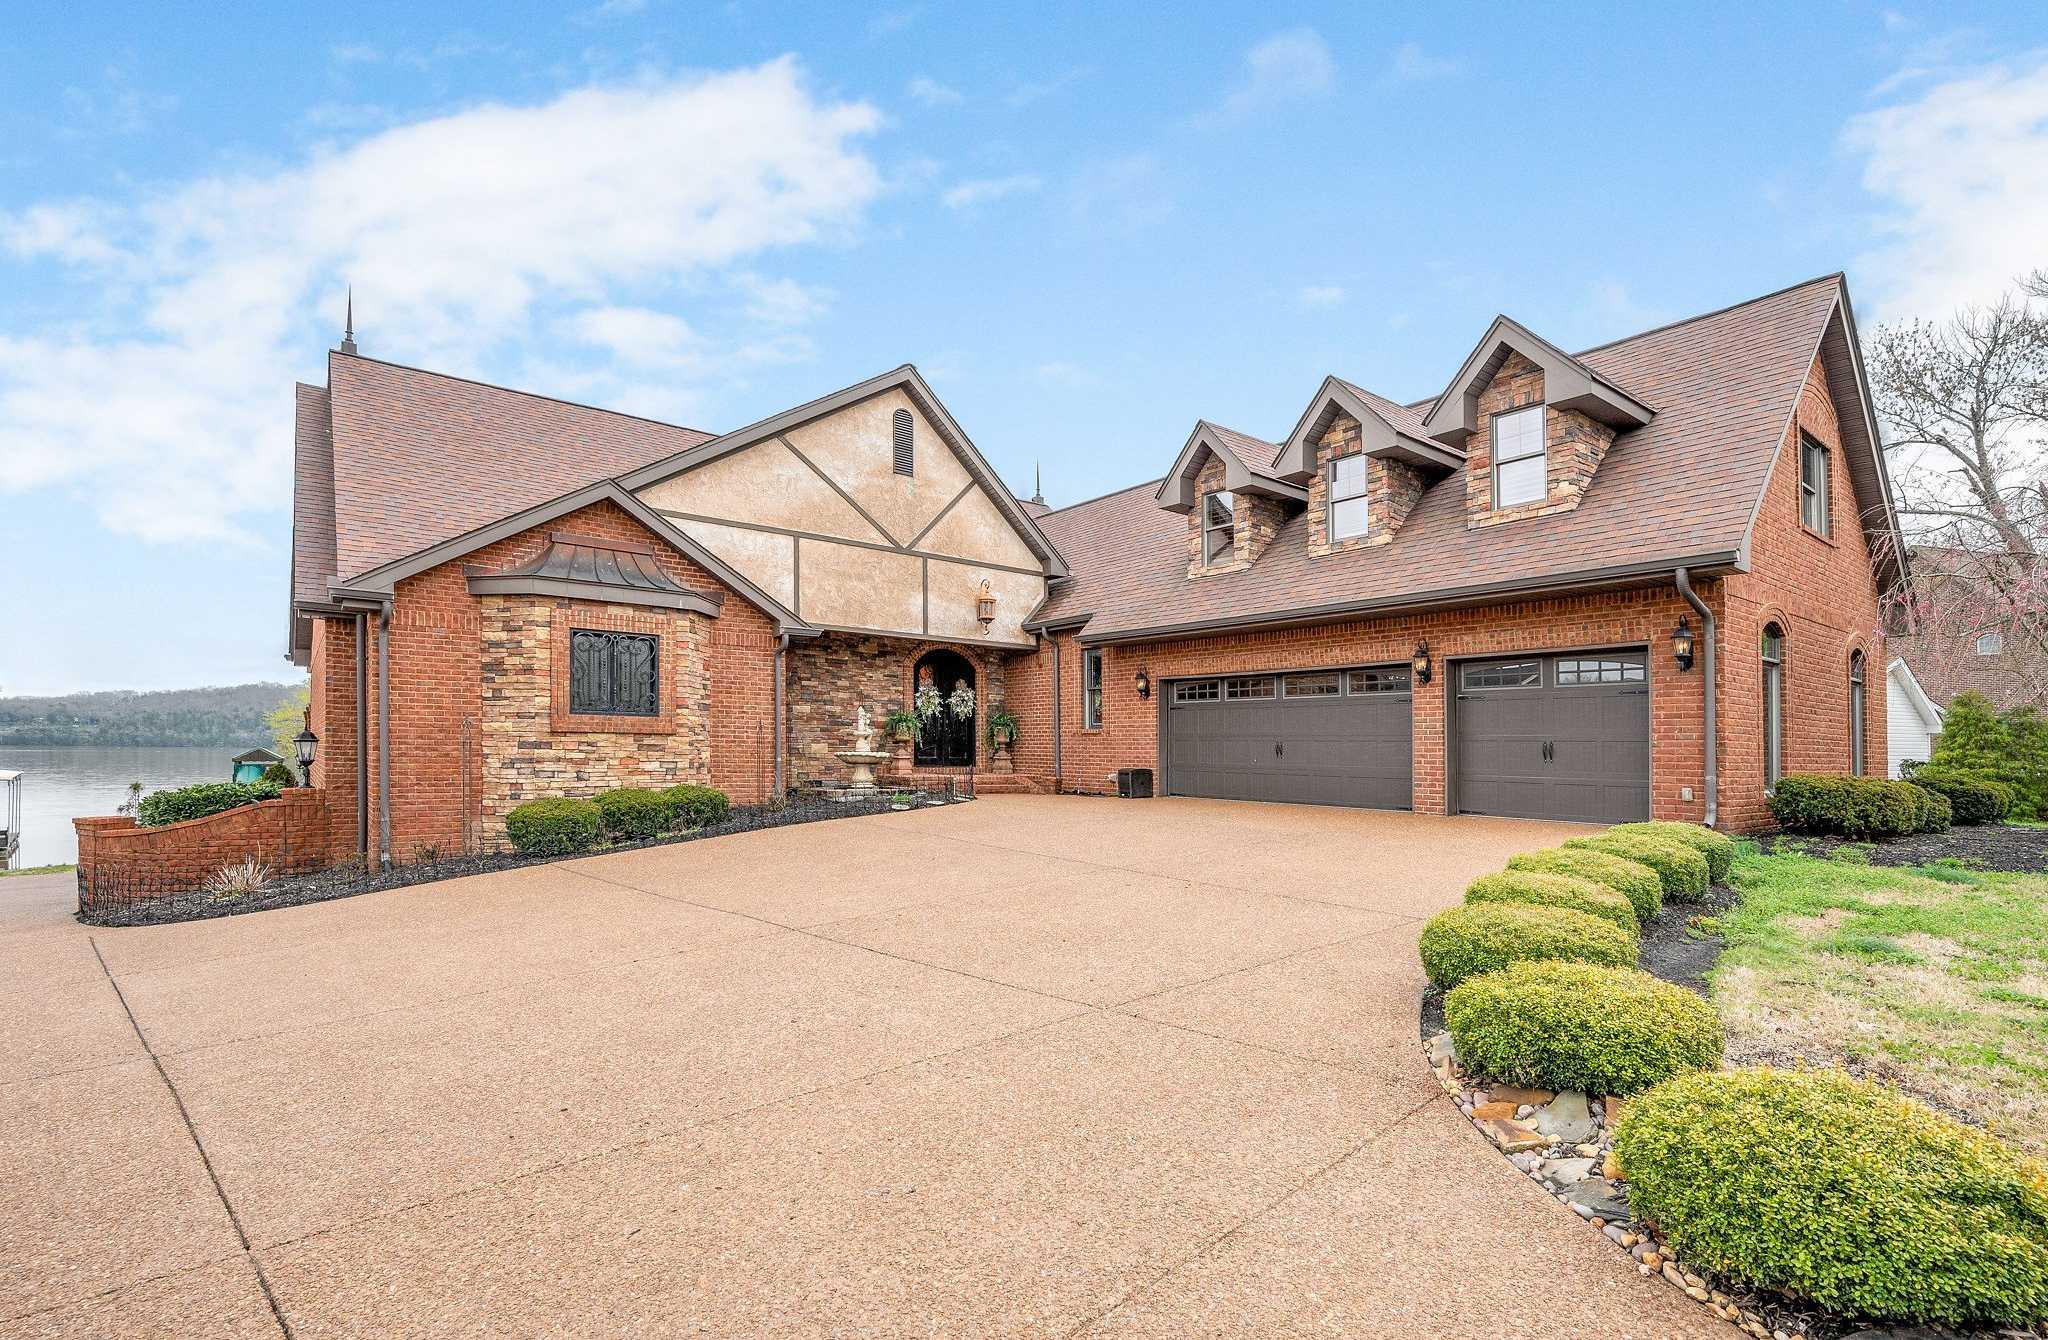 $1,274,900 - 4Br/5Ba -  for Sale in Crown Point Est, Mount Juliet